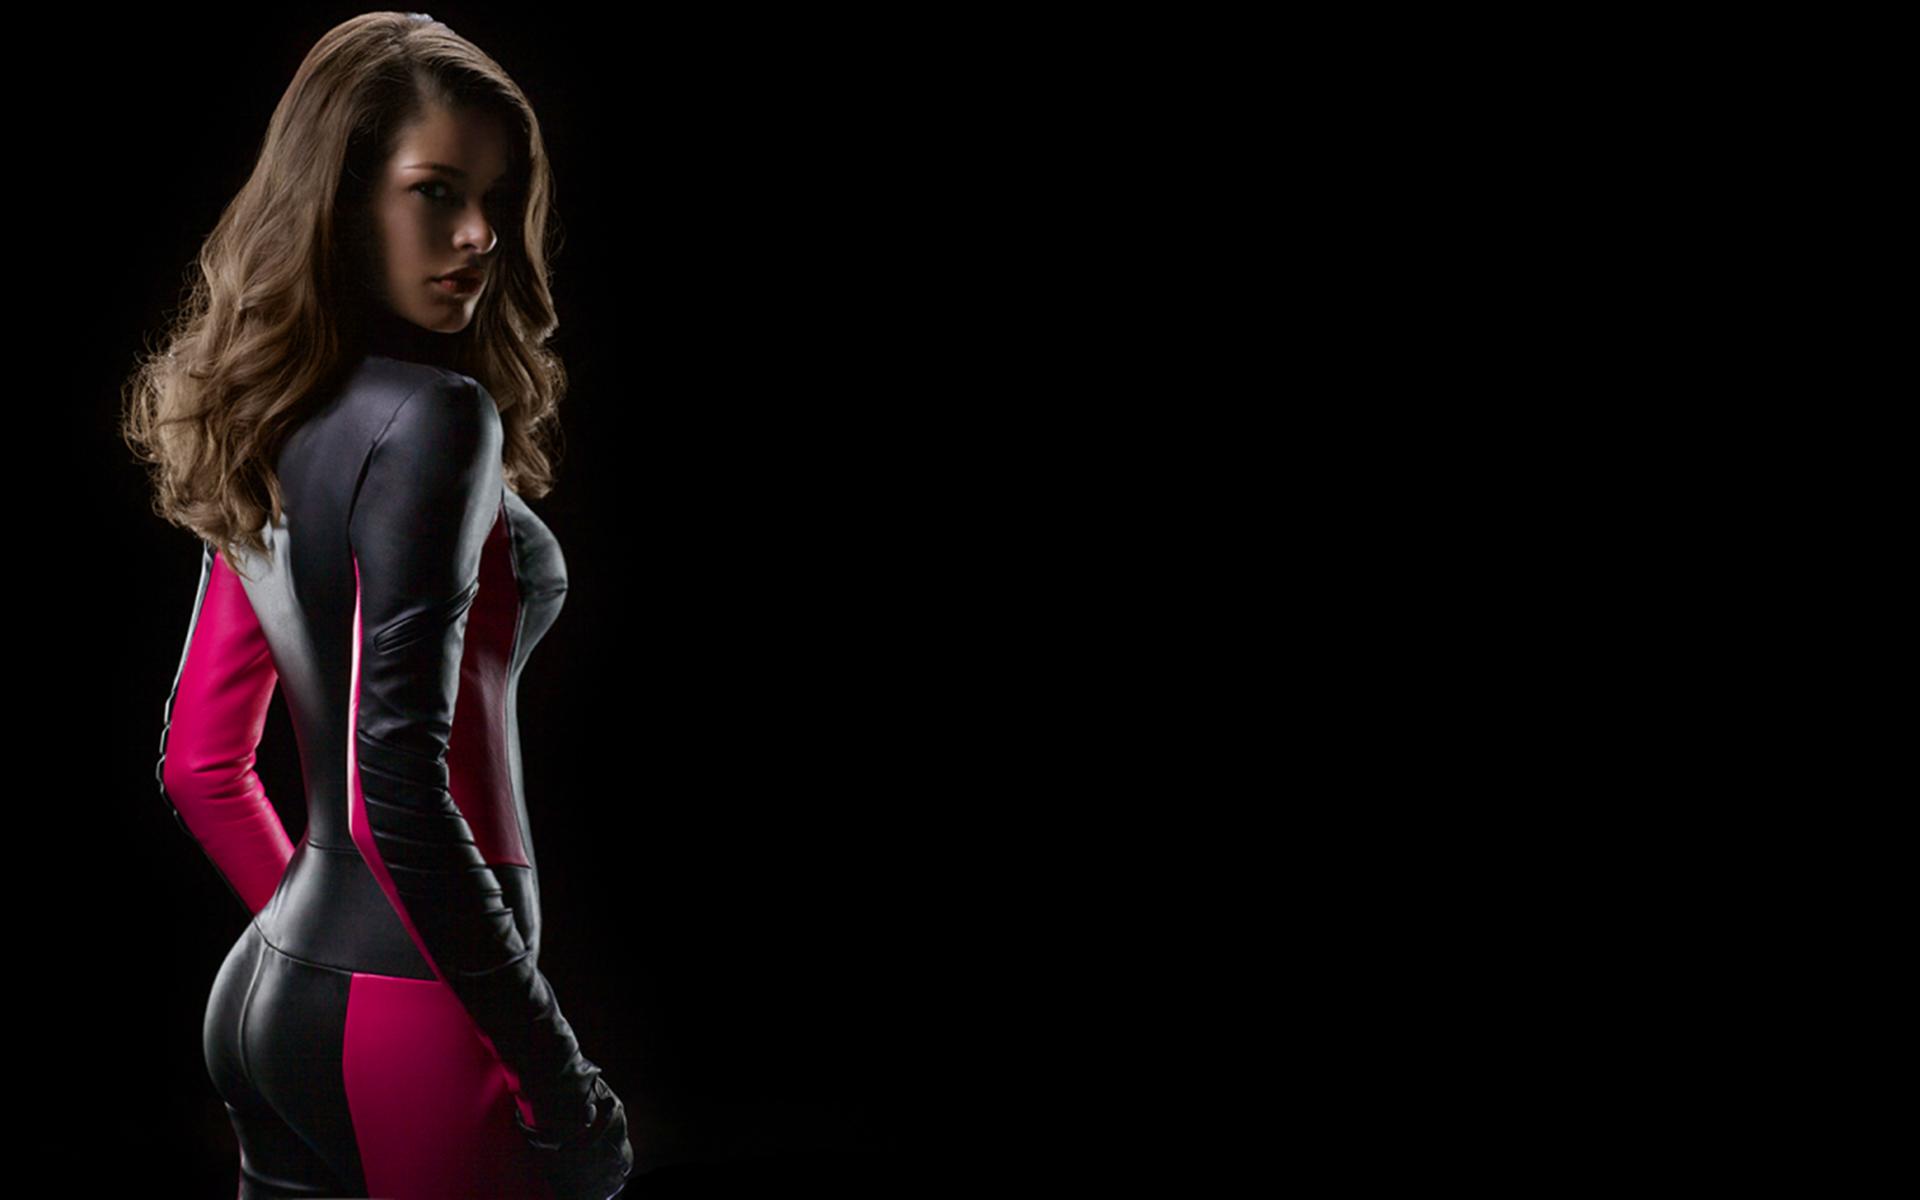 Bodysuit T Mobile Women Mission Impossible